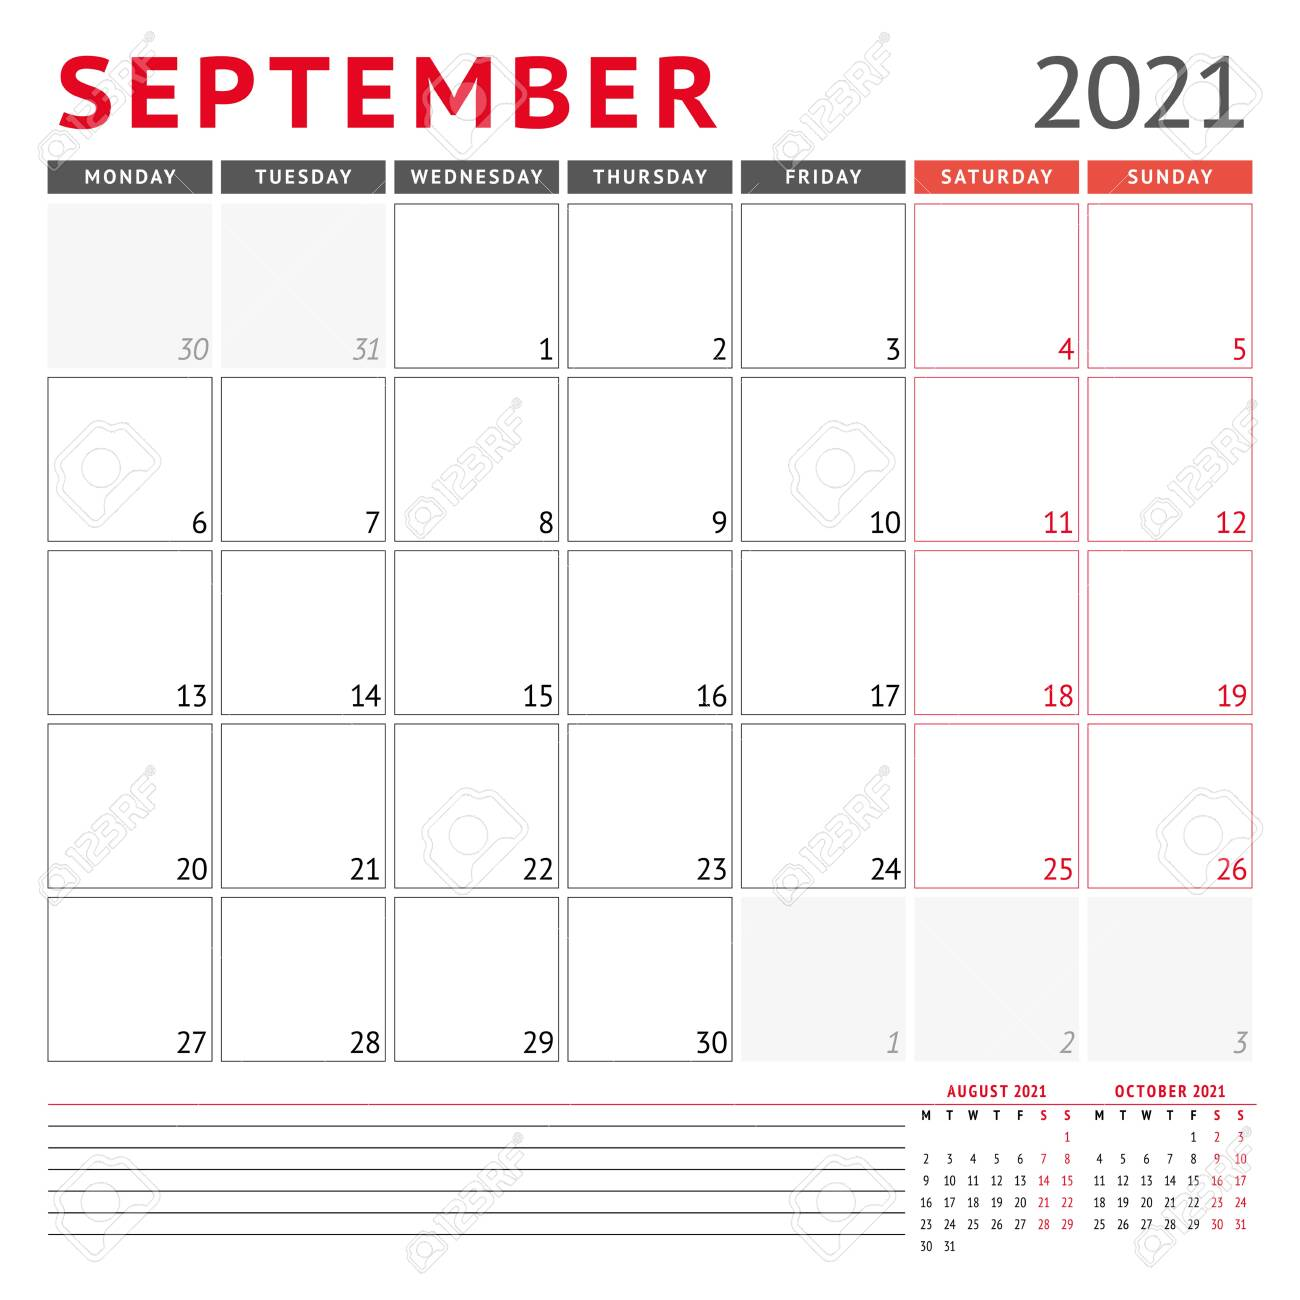 Calendar template for September 15. Business monthly planner. Stationery  design. Week starts on Monday. Vector illustration